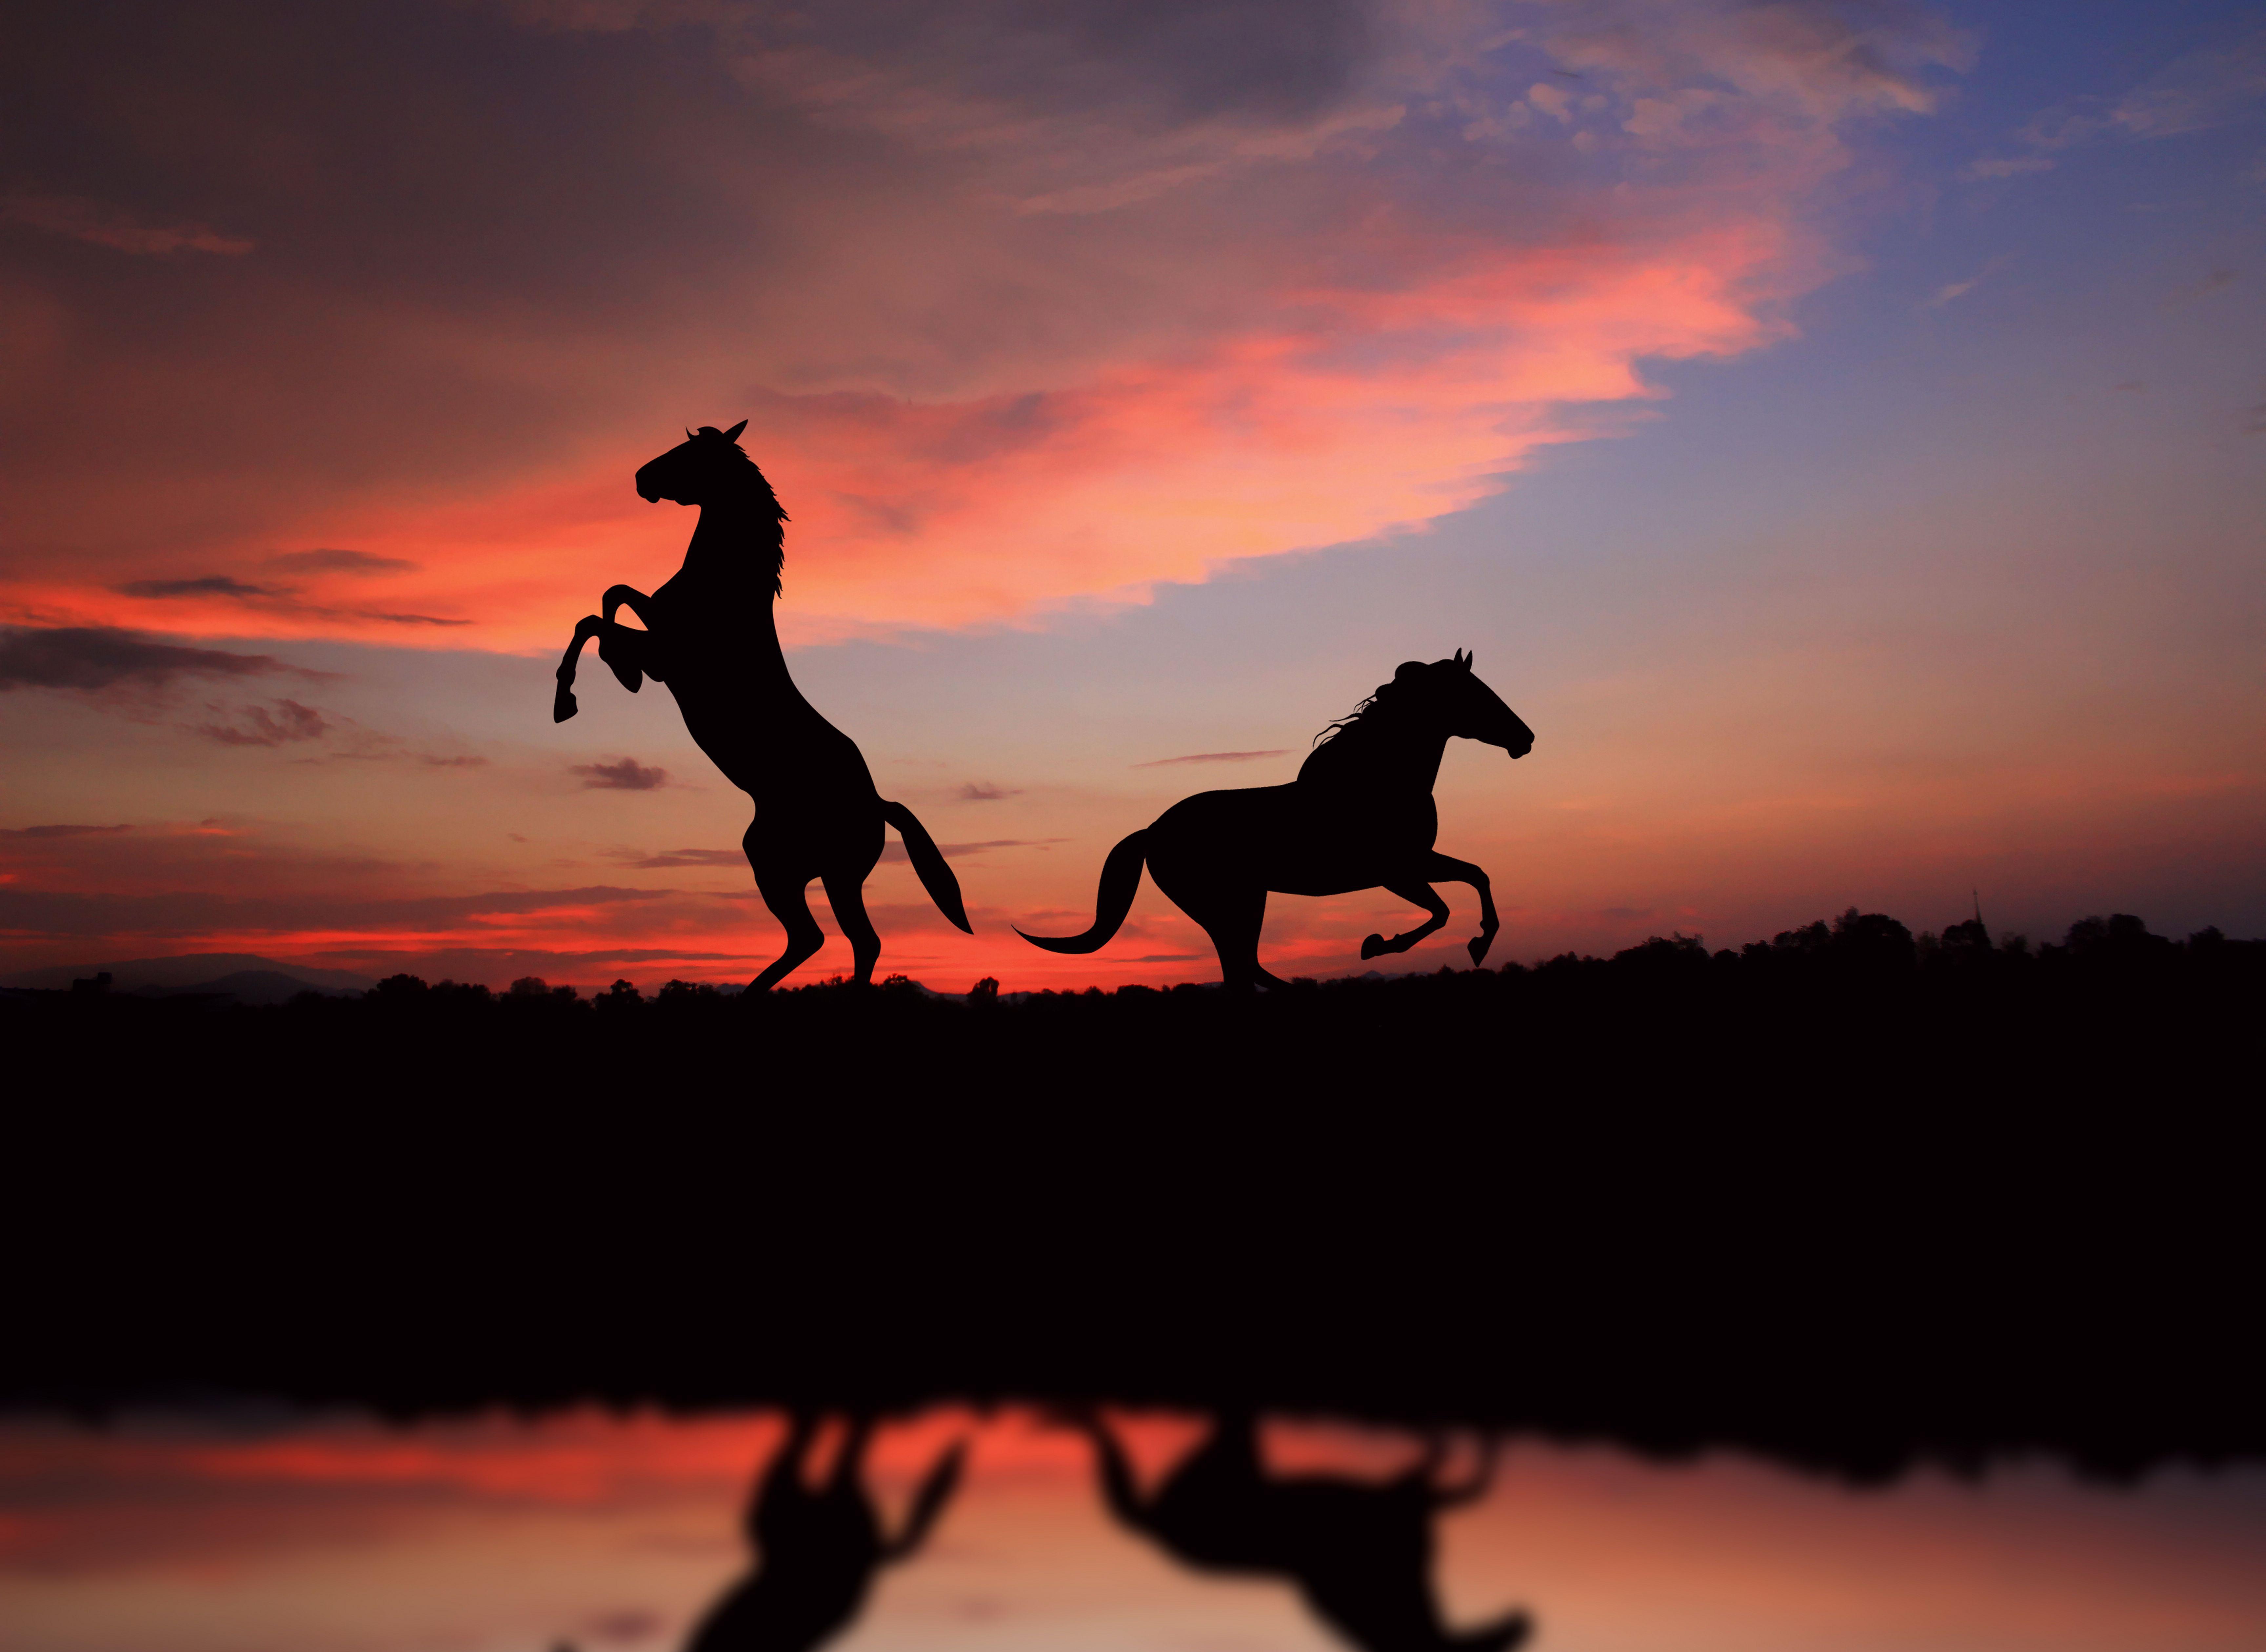 Обои на рабочий стол лошади на закате